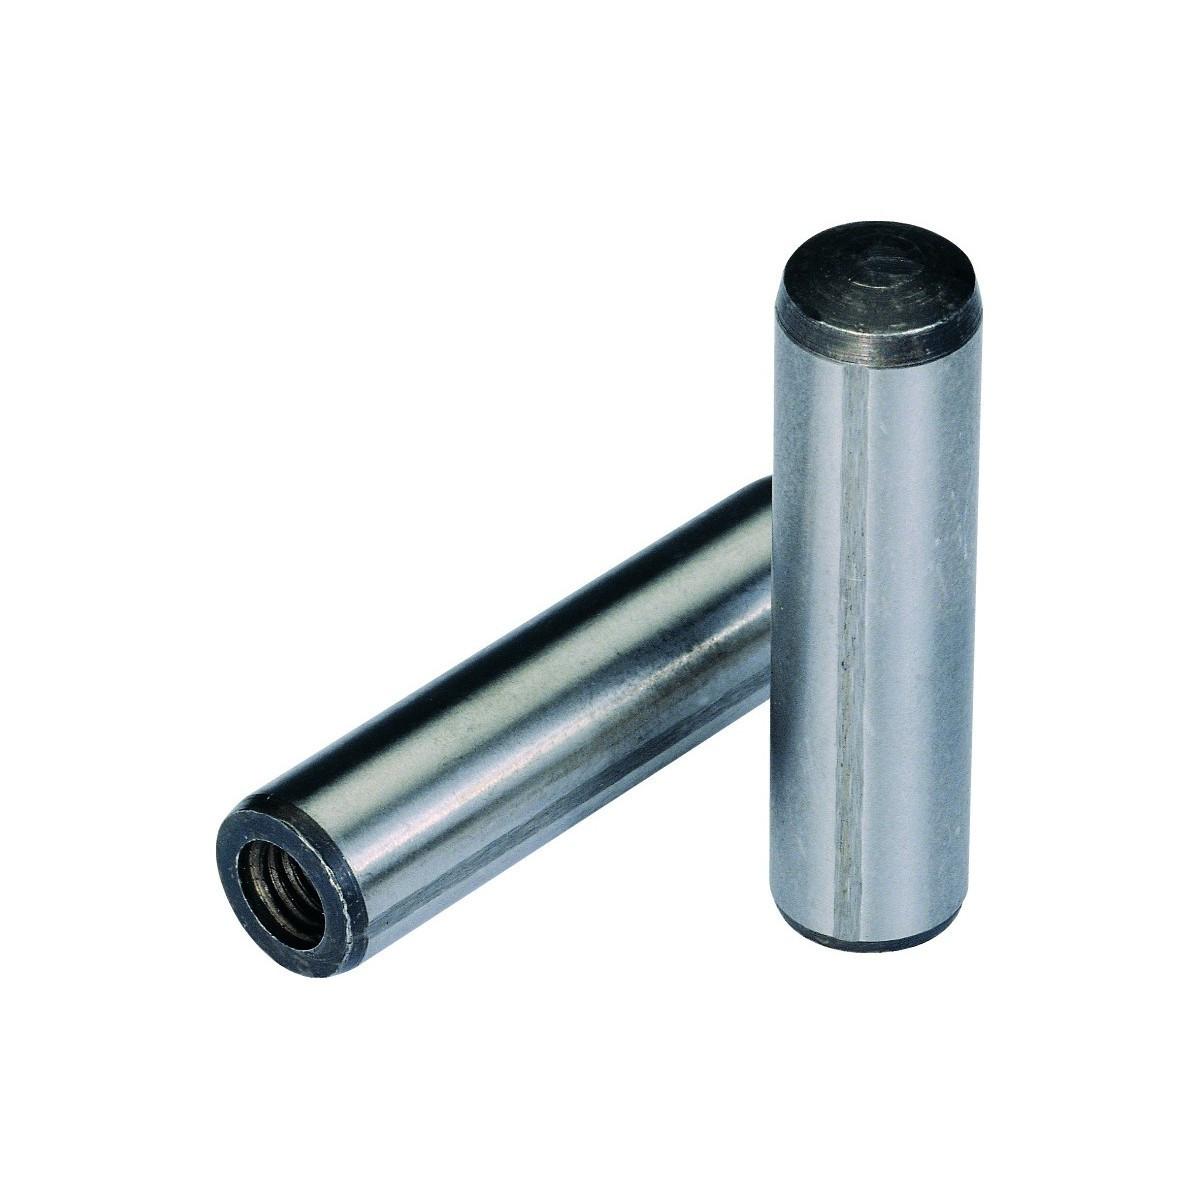 Штифт цилиндрический MMG  DIN 7979D M16 х 45 Класс 10.9 (Фосфат) 1 шт